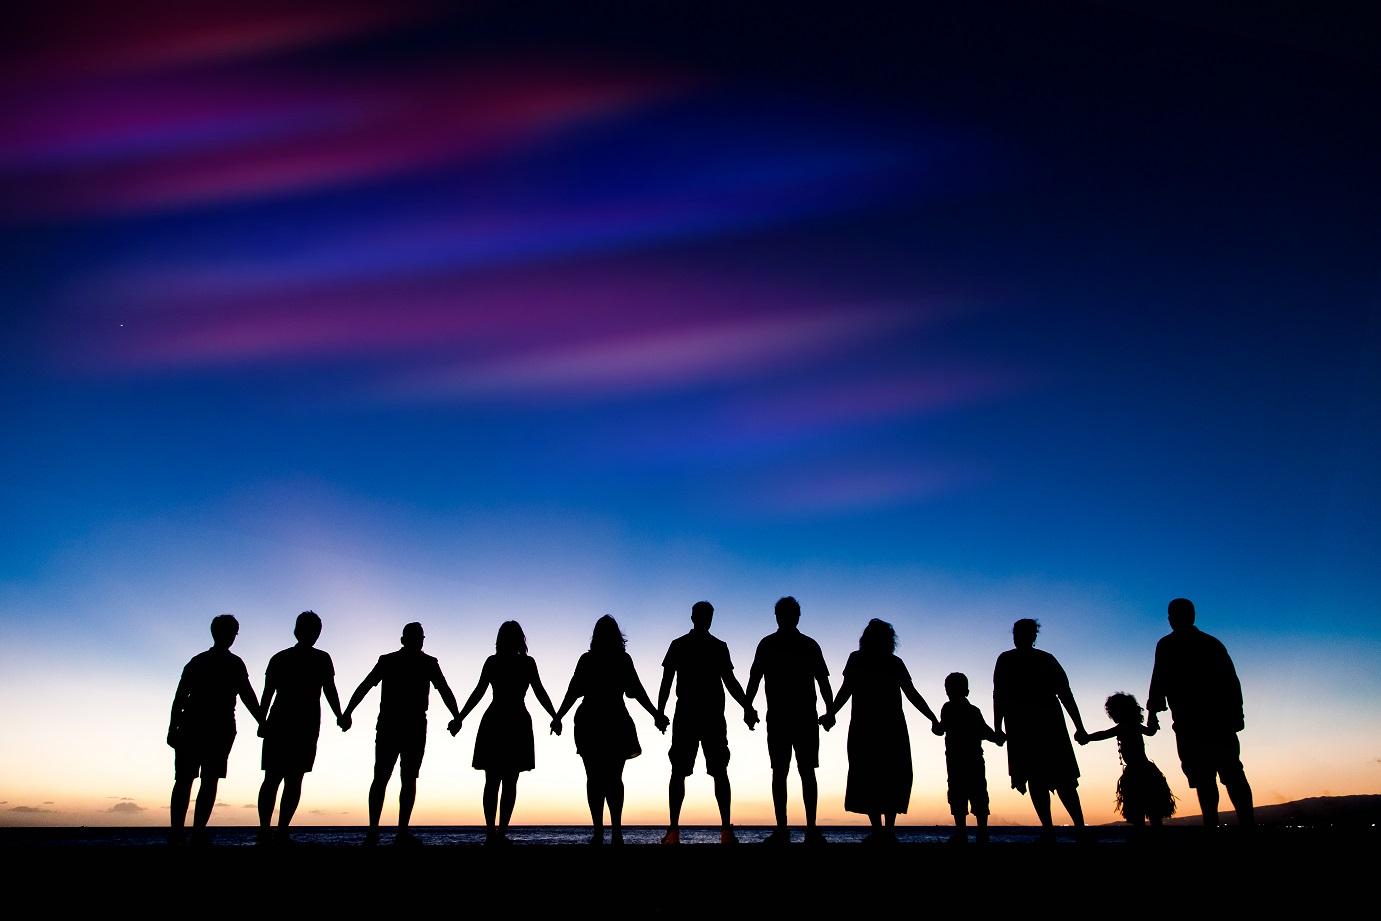 oahu family beach silhouette